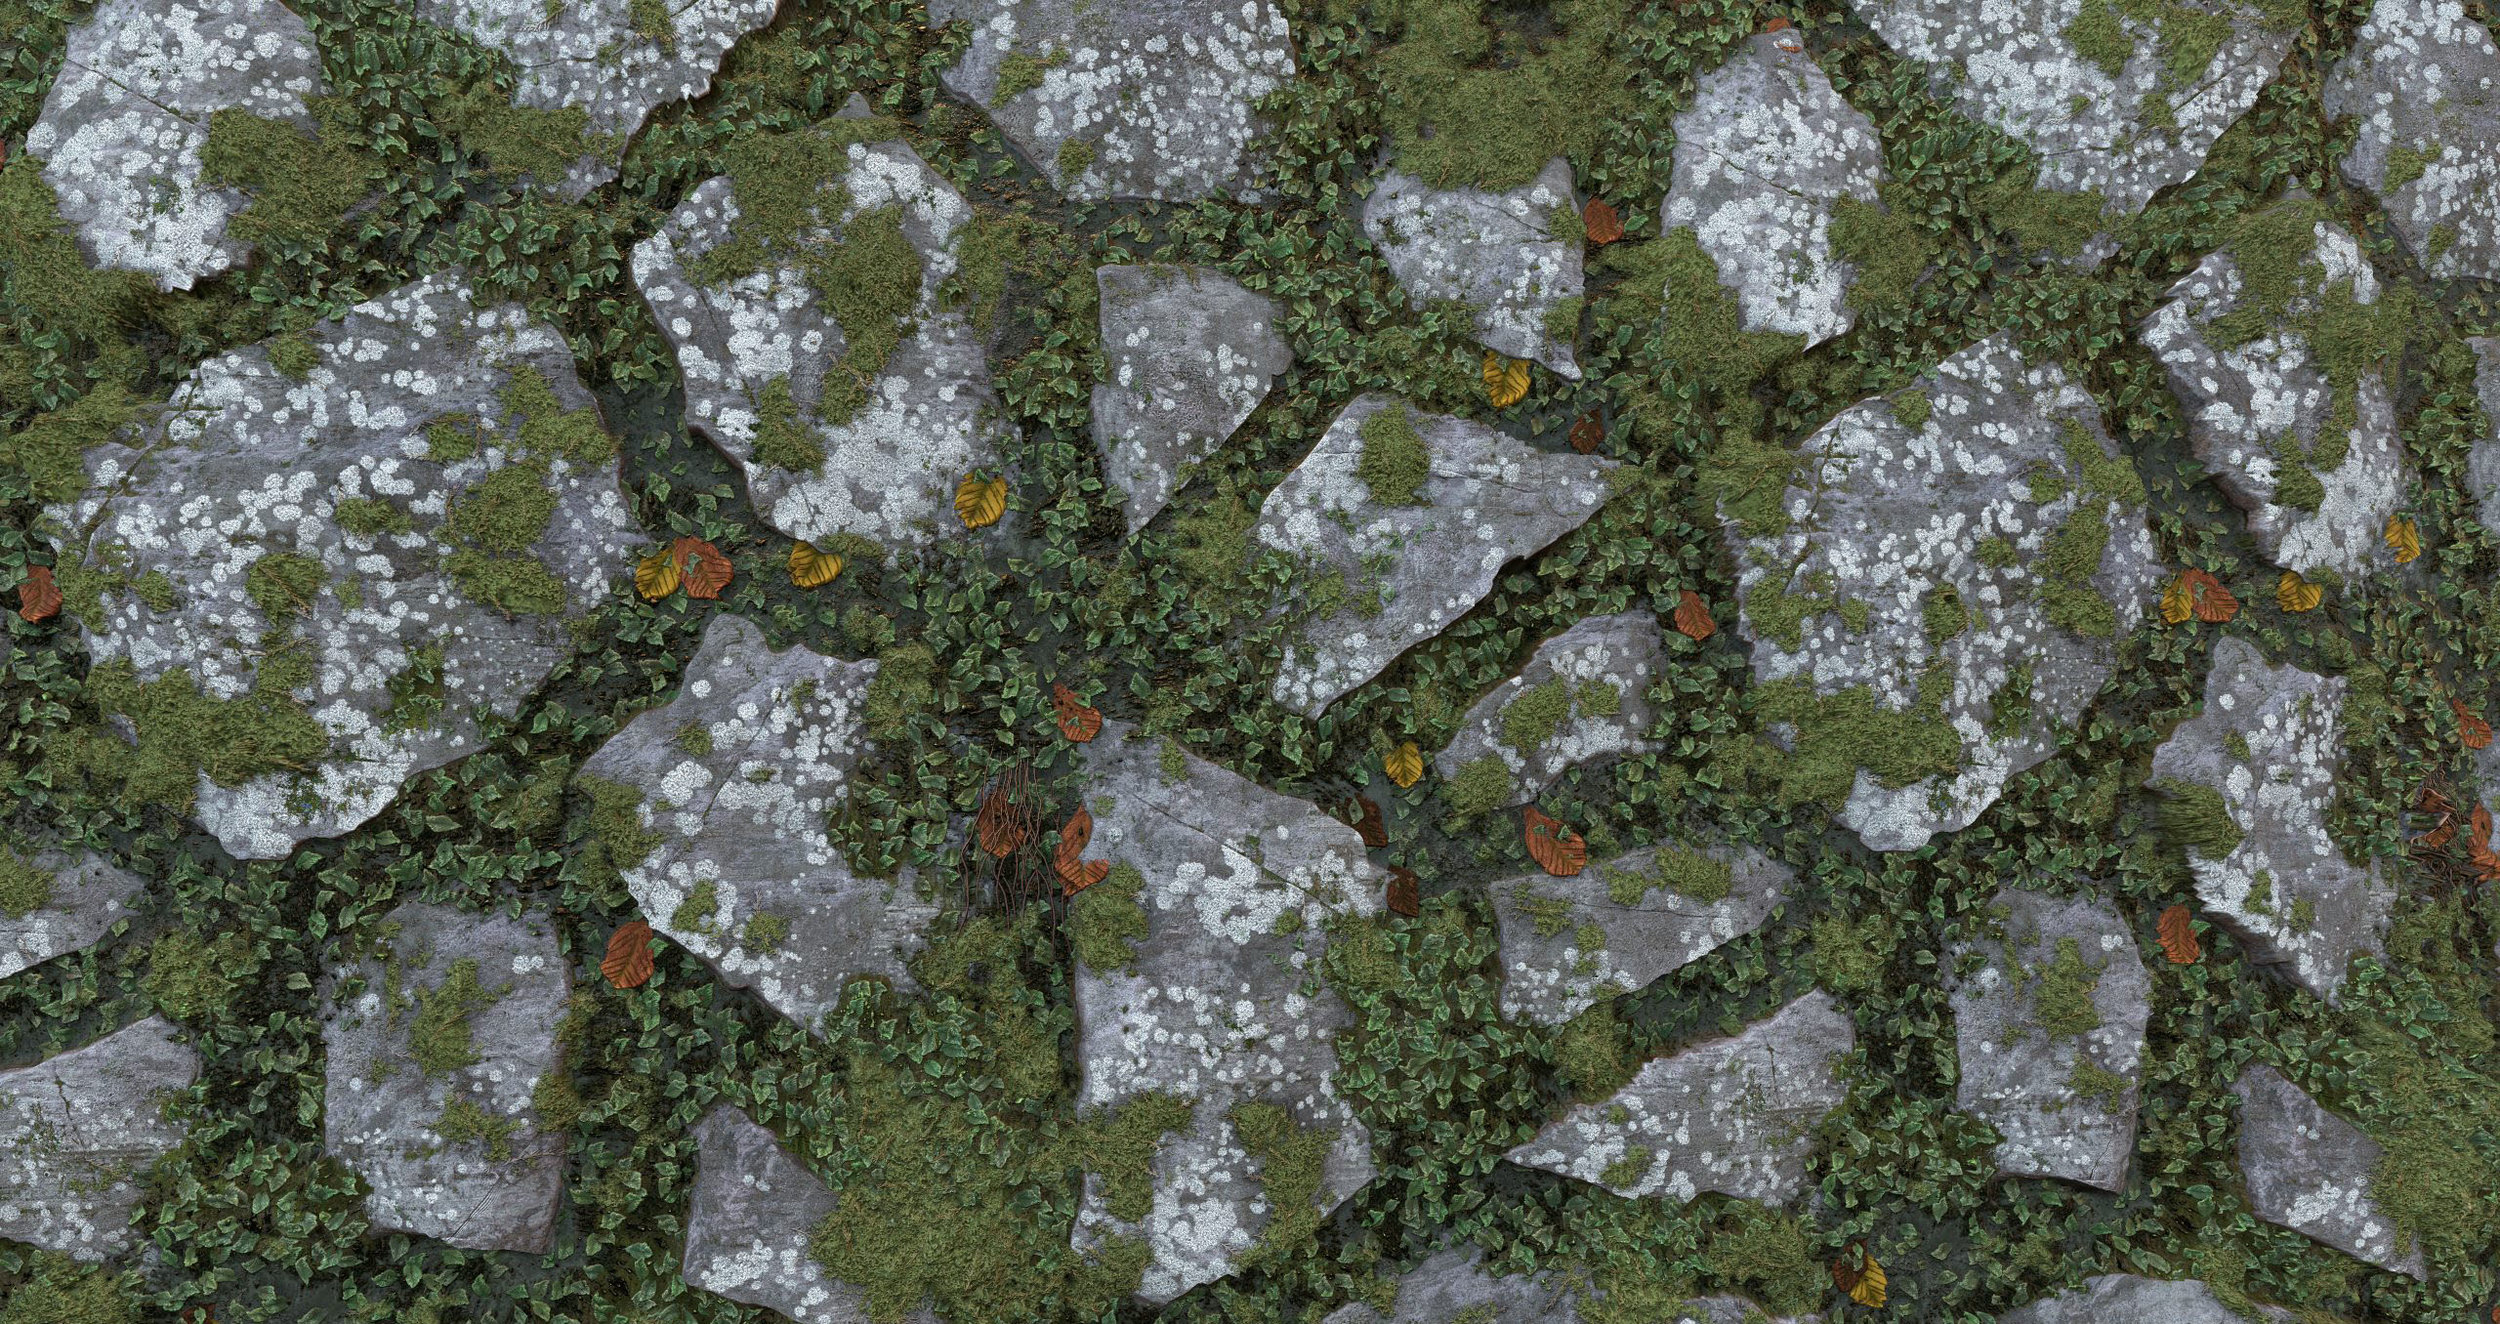 Stone_Wall_Var2.jpg